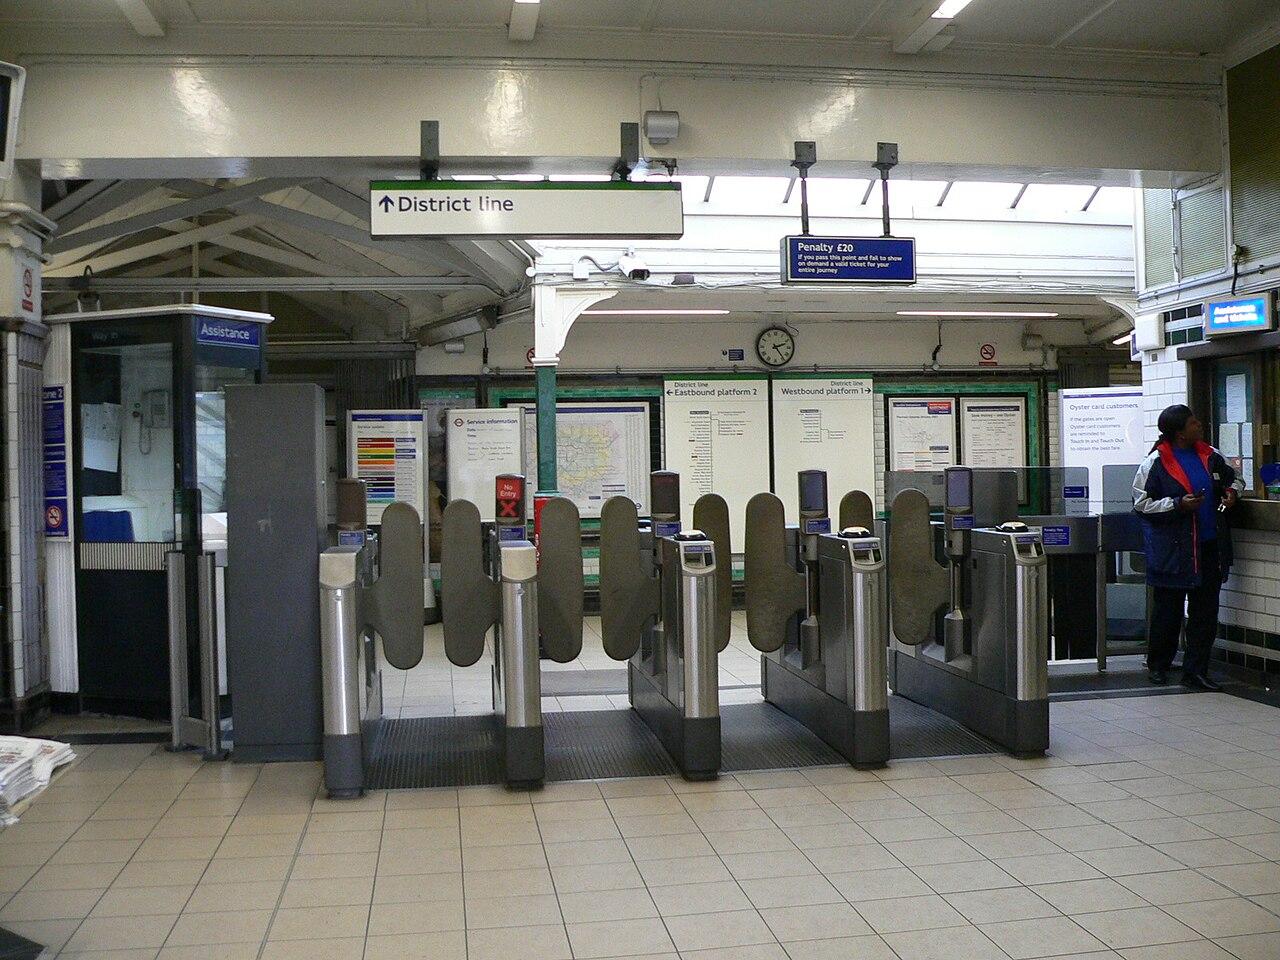 1280px-West_Kensington_tube_station_gate